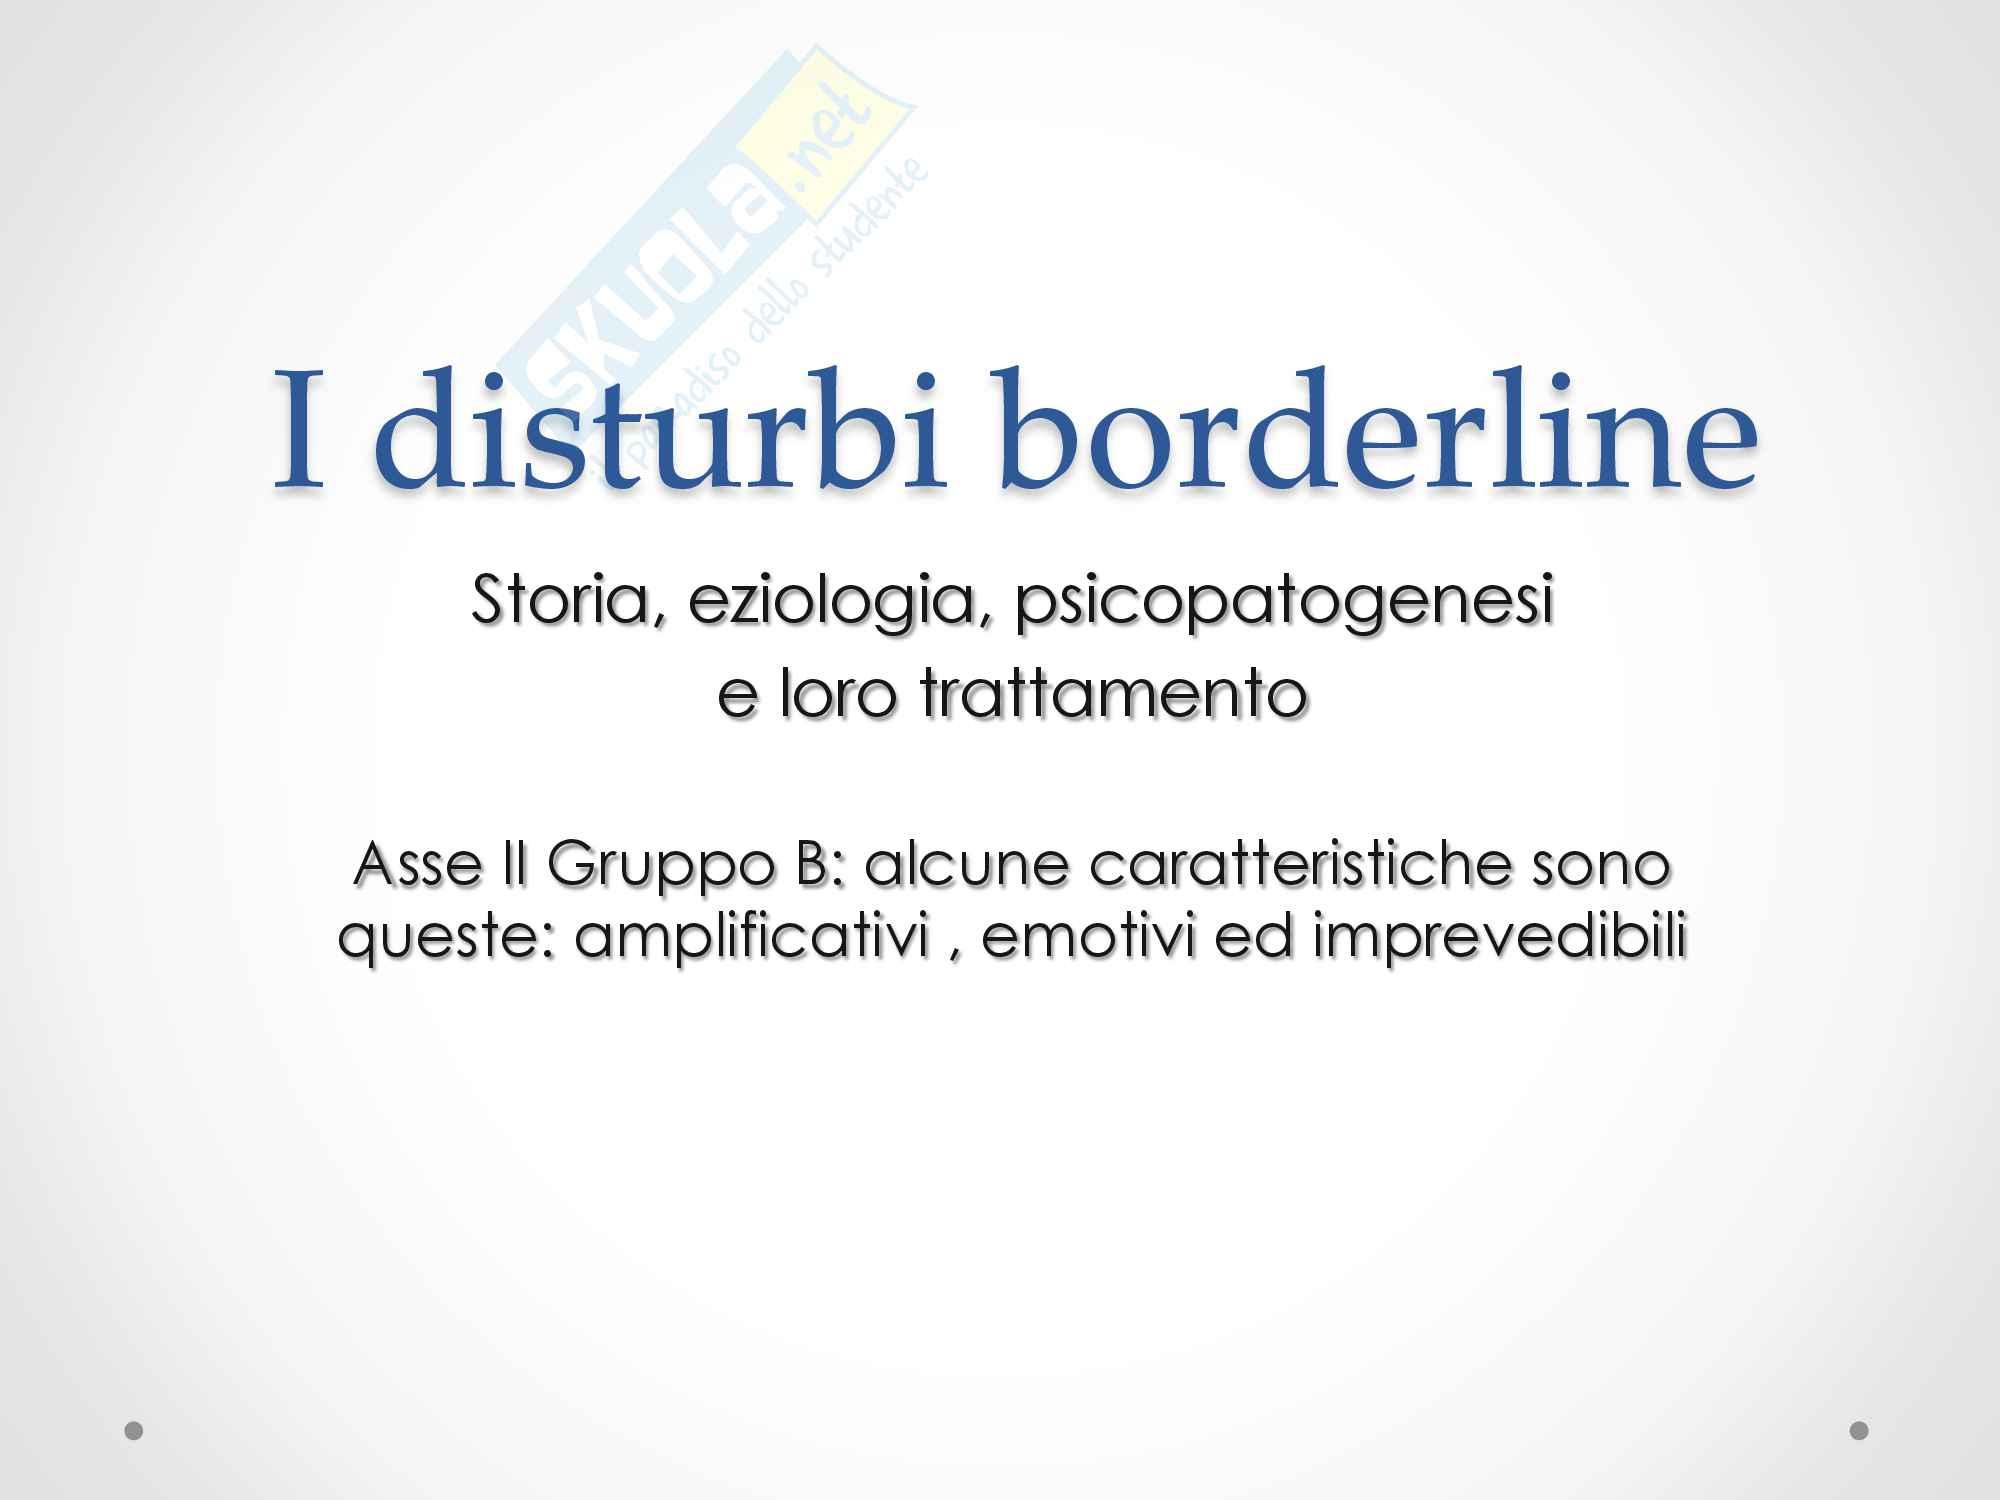 I disturbi borderline